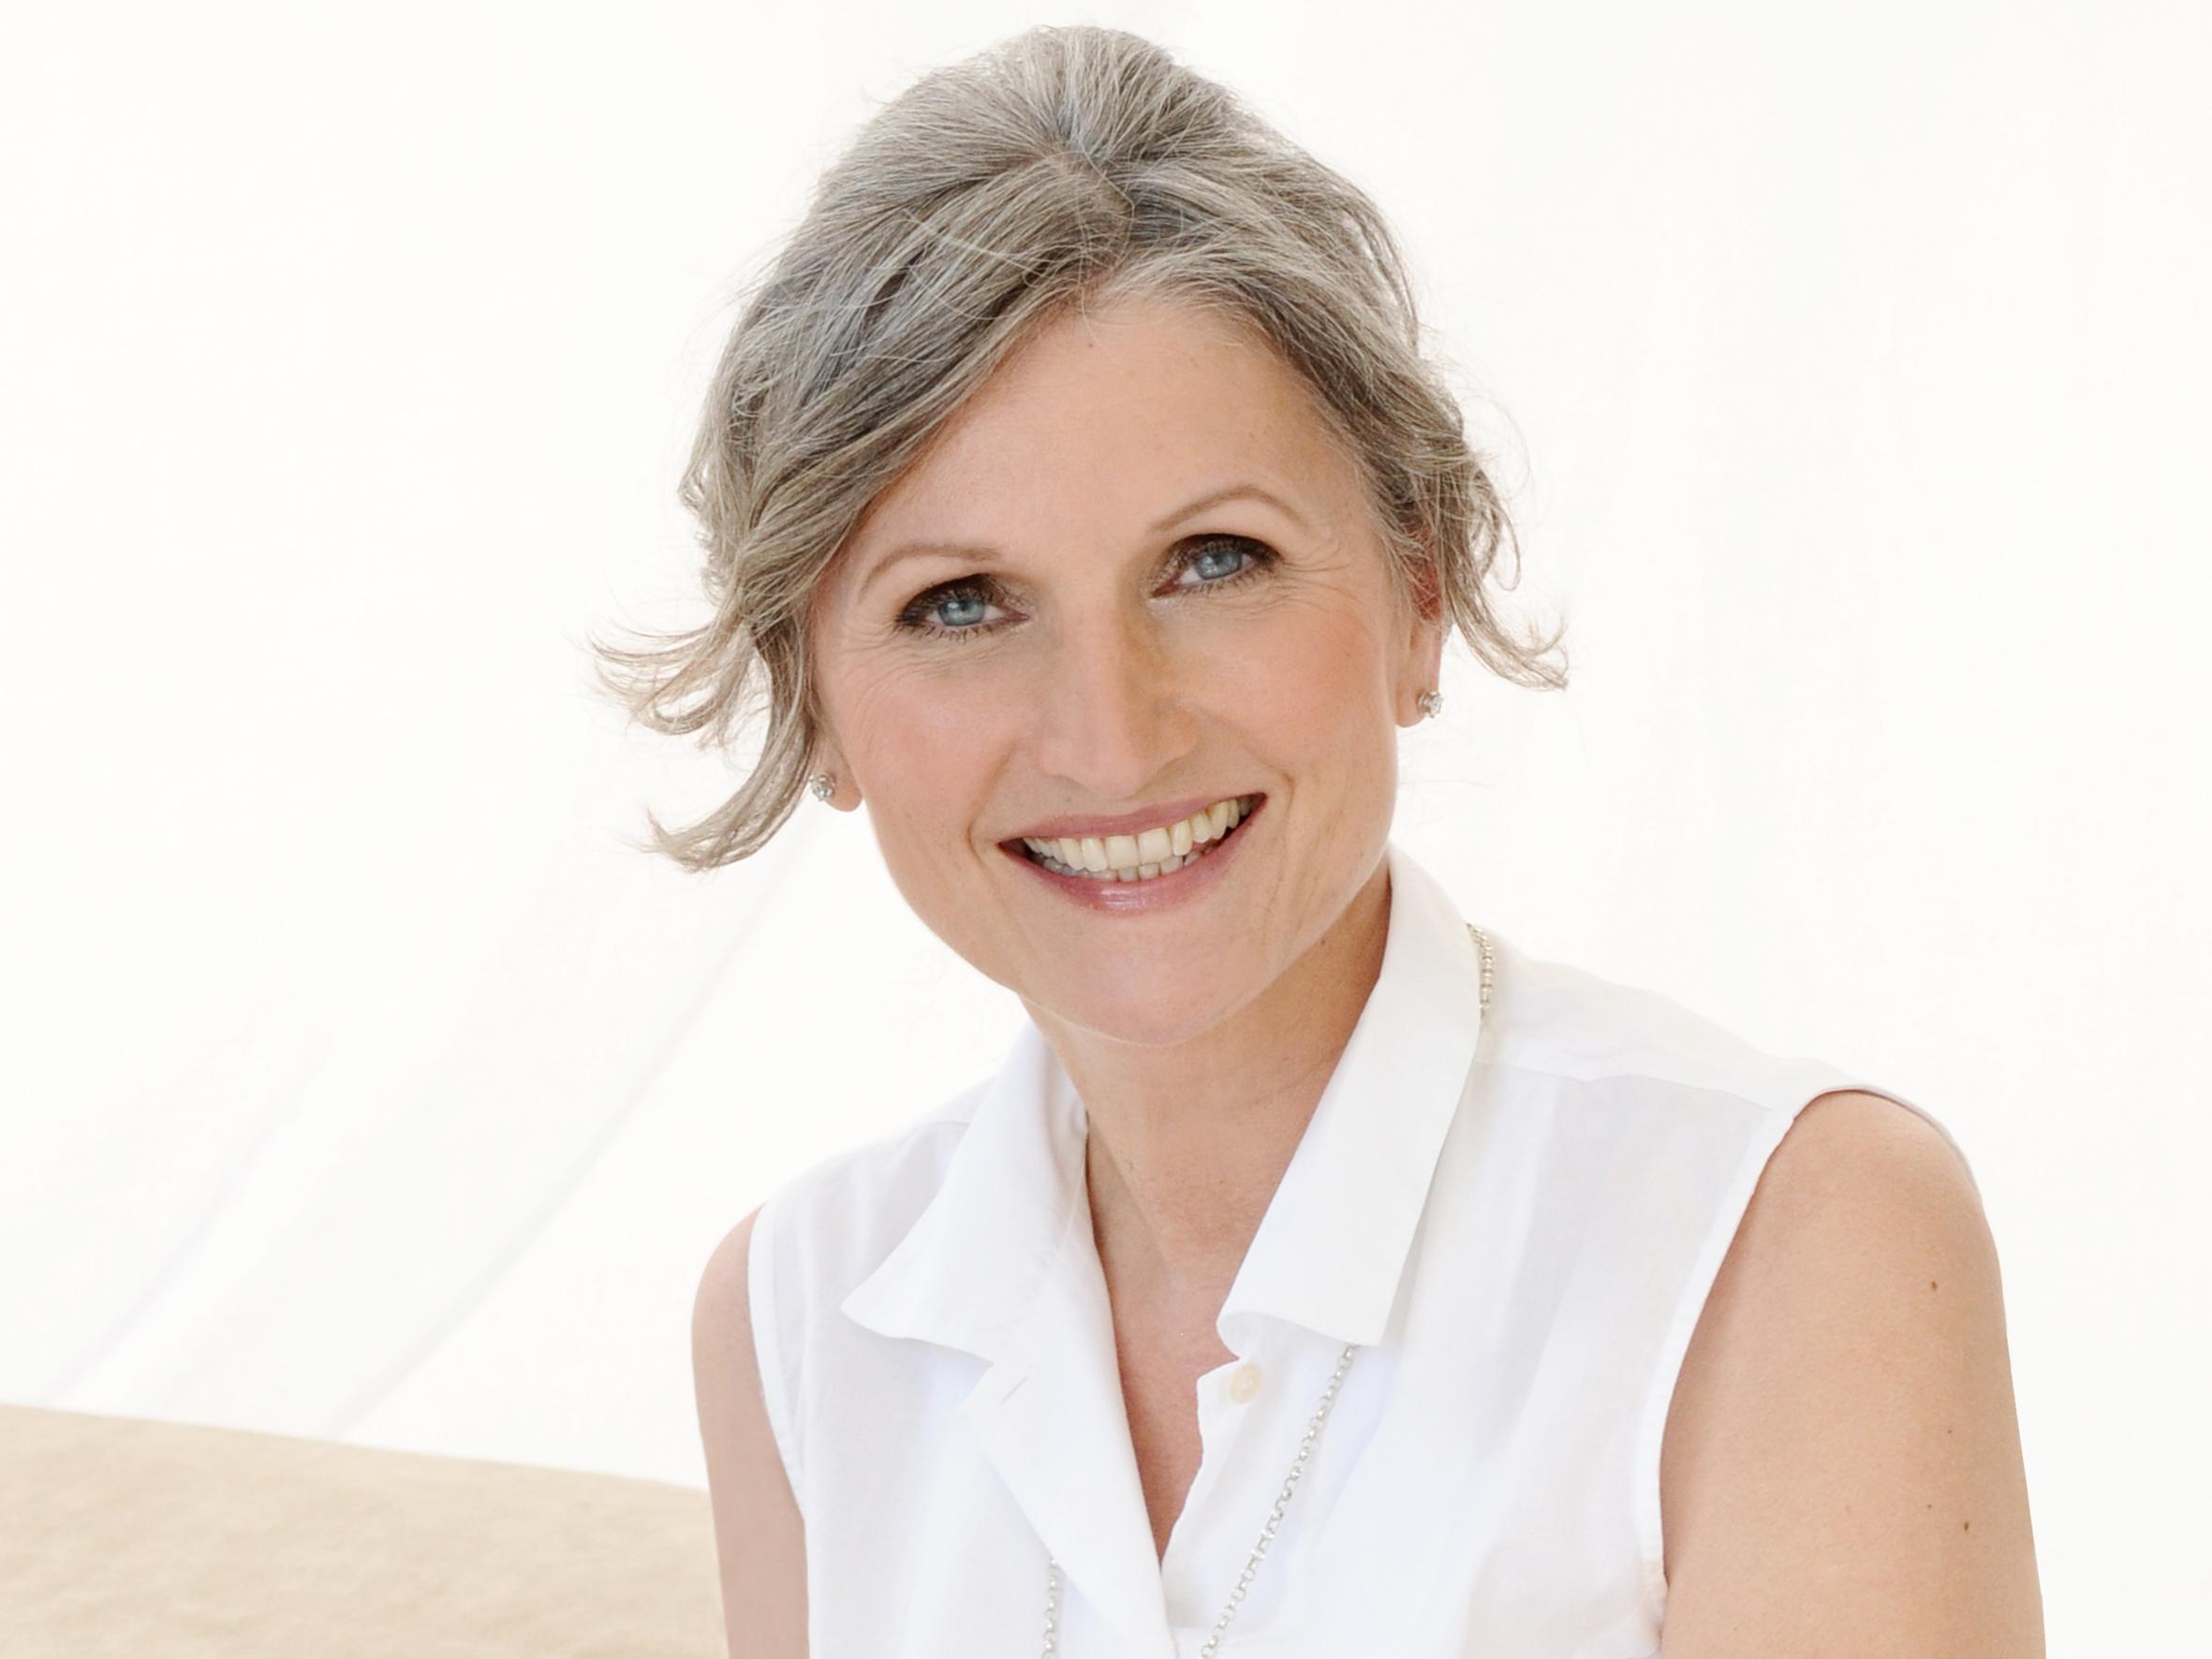 Gisela Steinlein